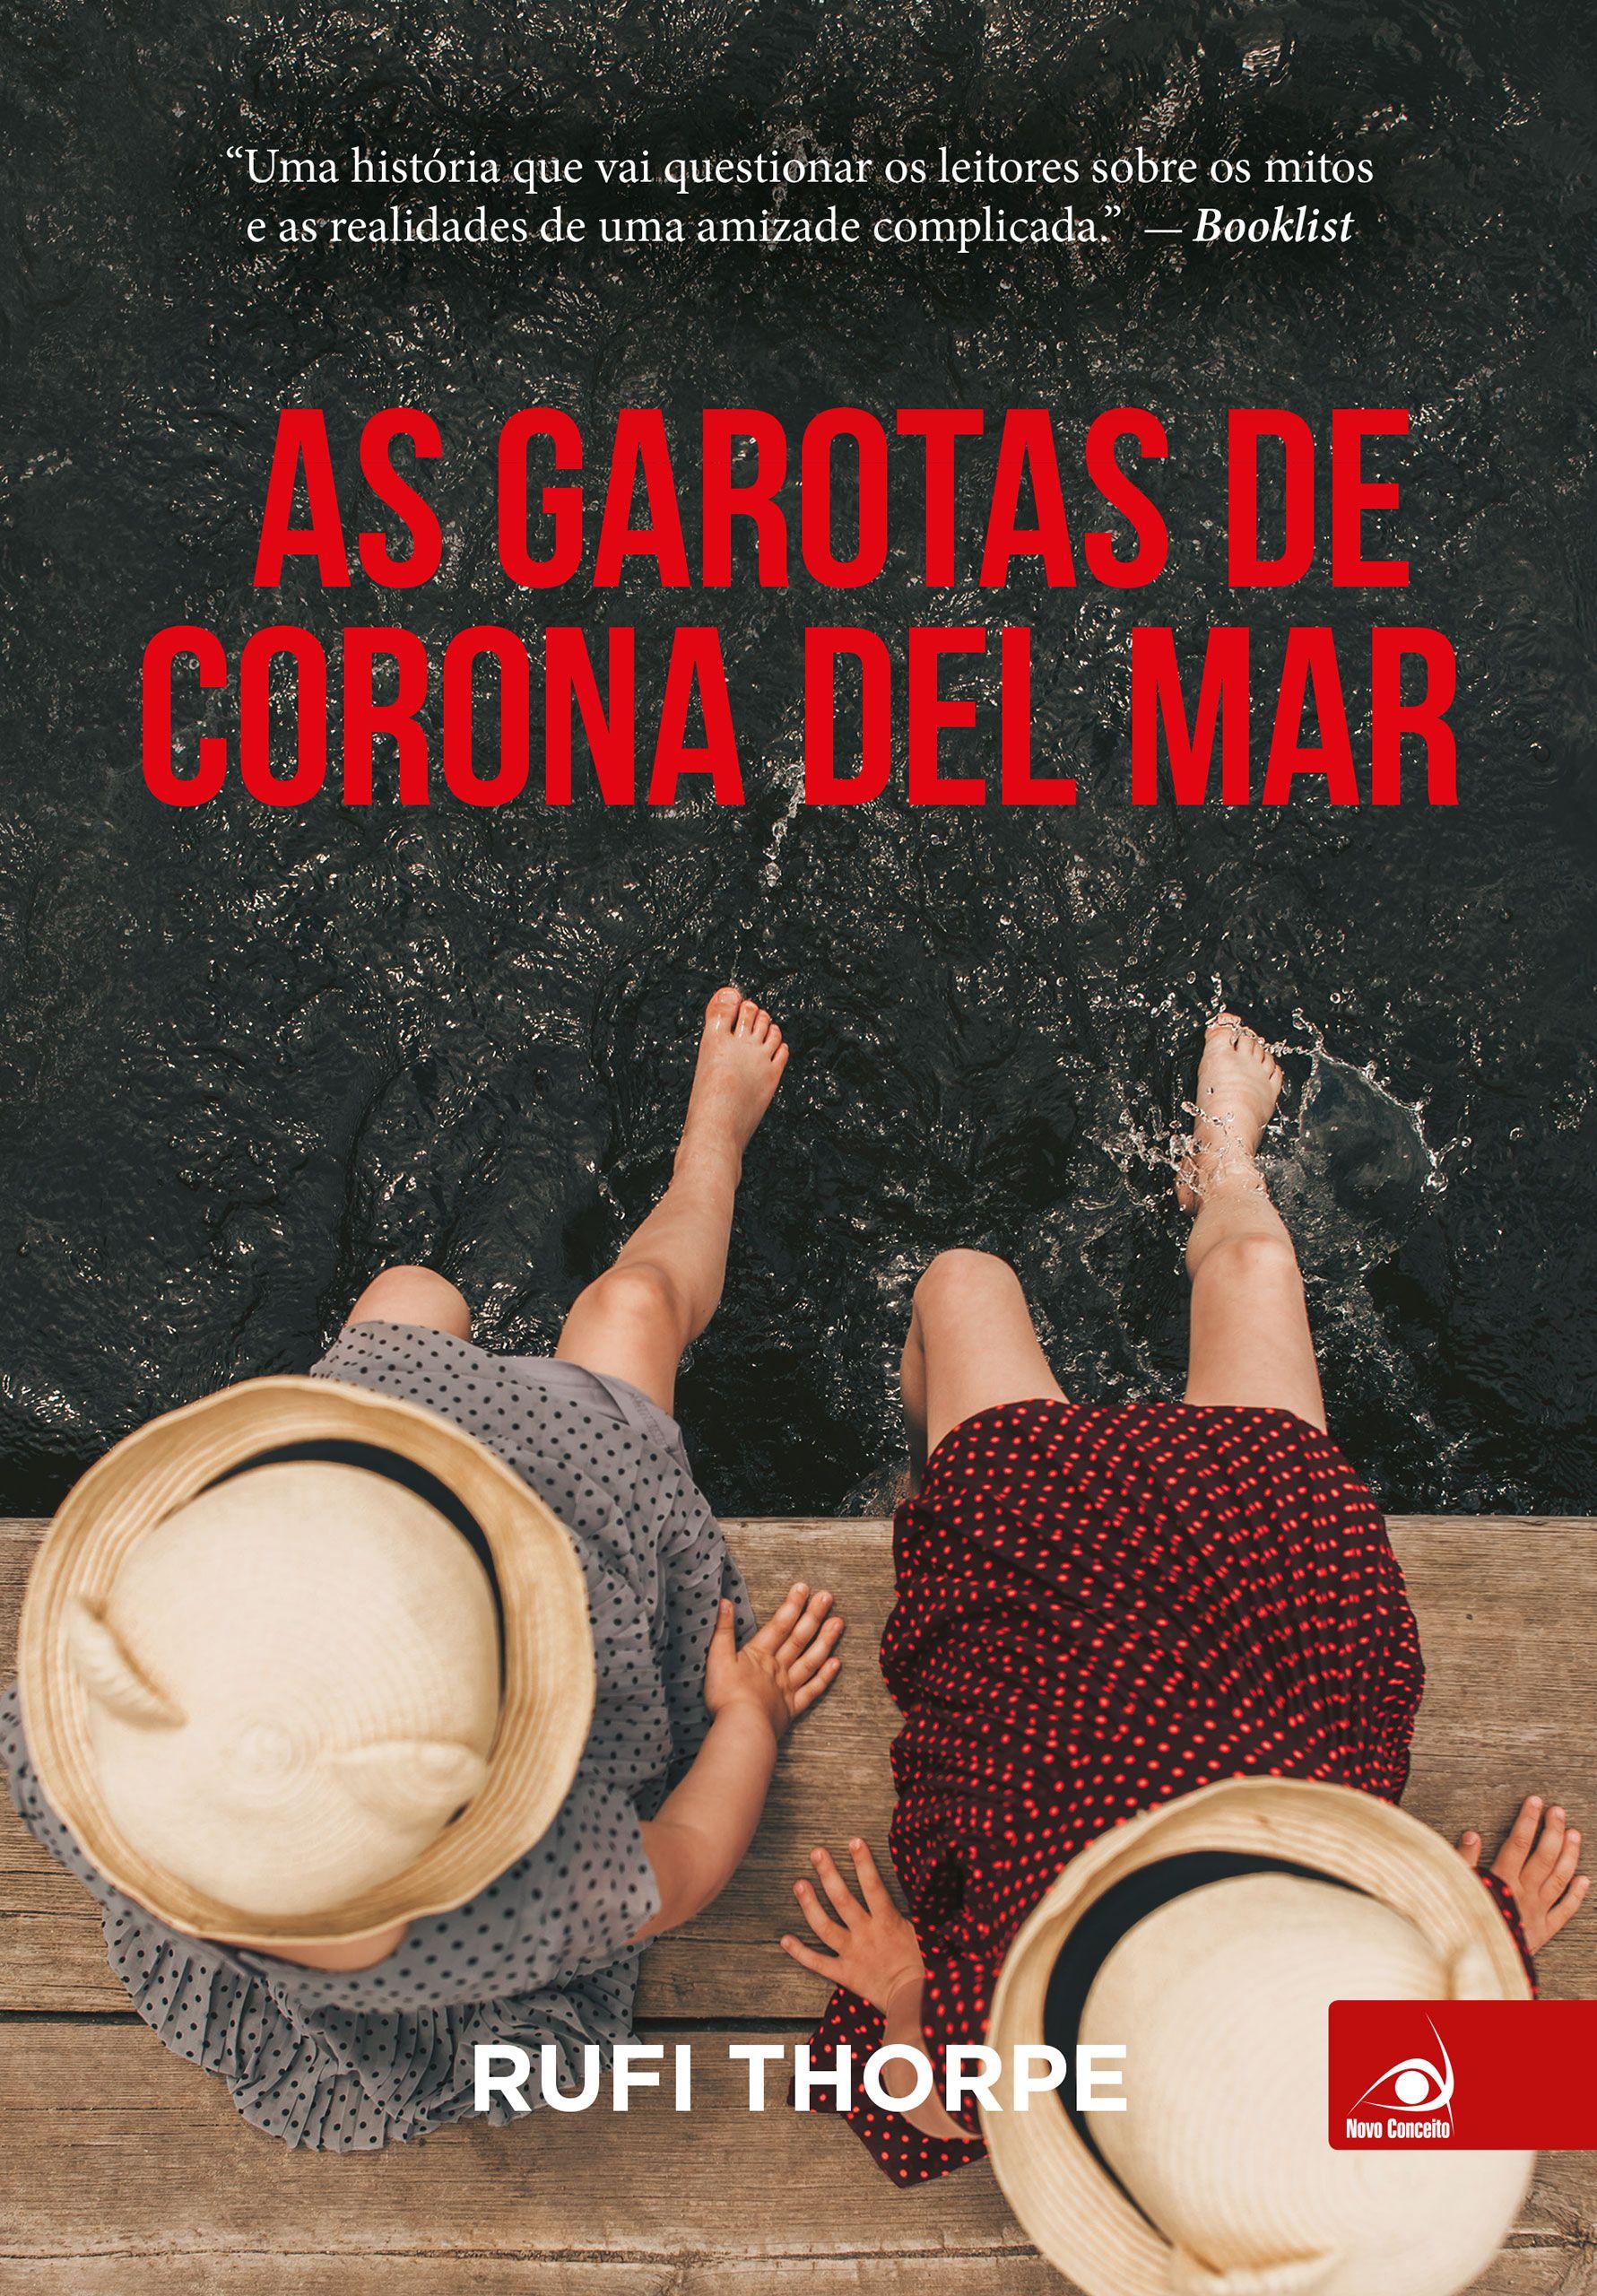 As Garotas De Corona Del Mar Rufi Thorpe Leitura Del Mar